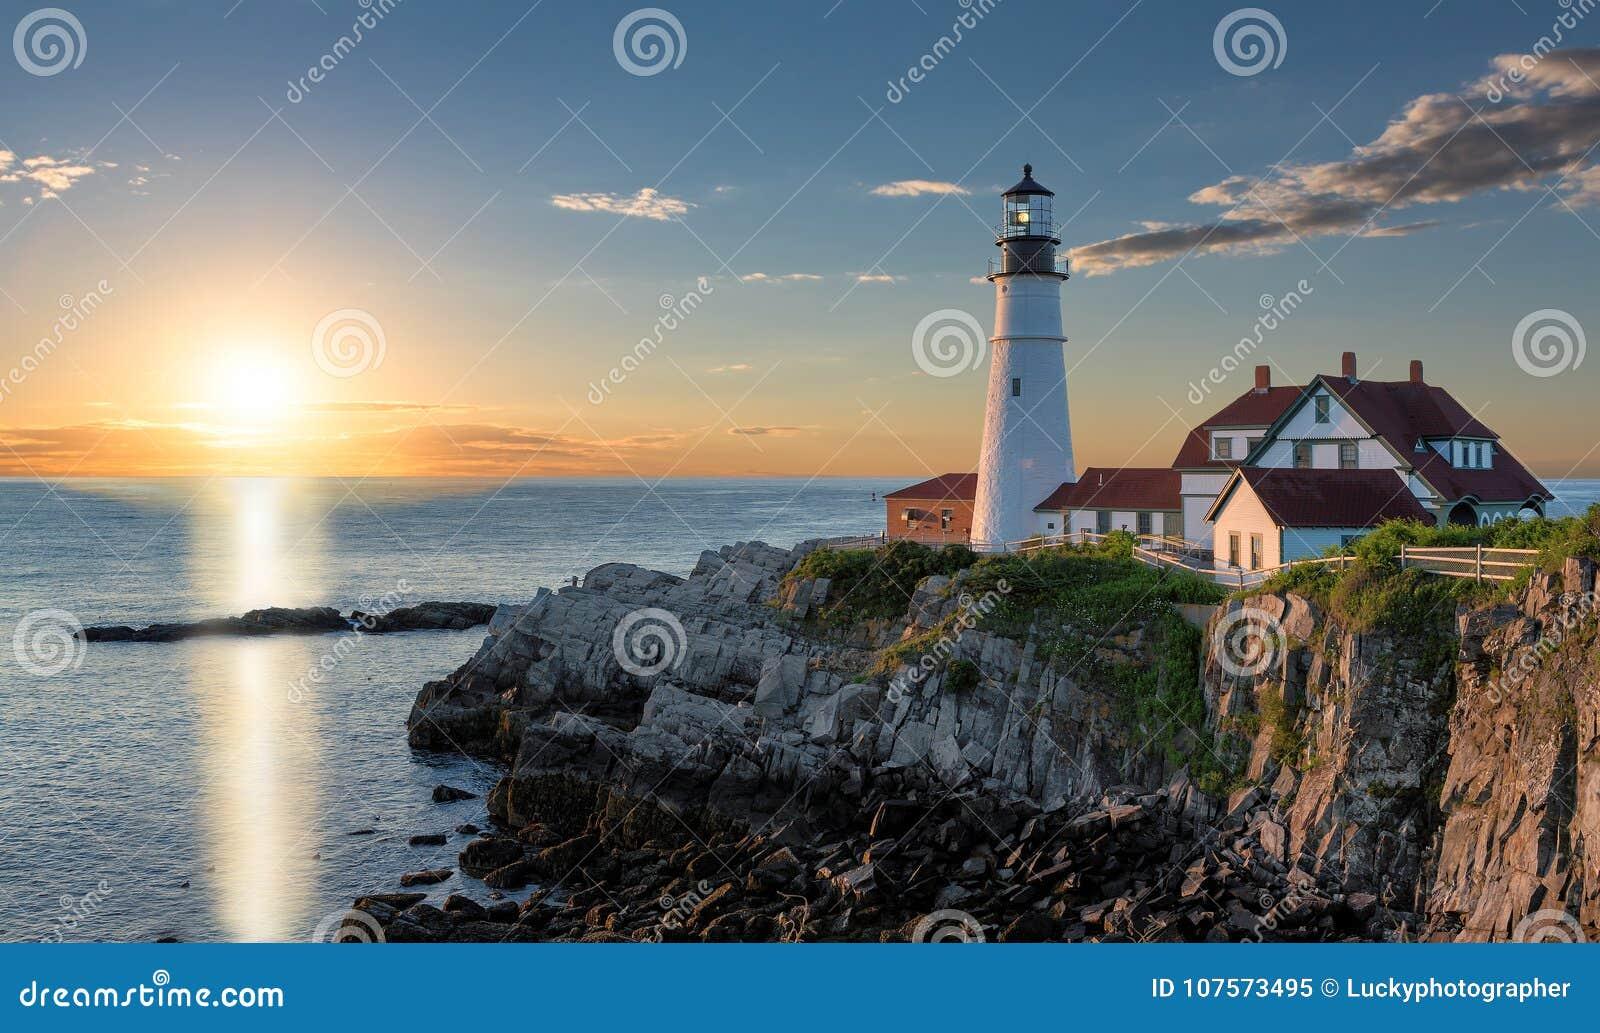 Sunrise at Portland Lighthouse in Cape Elizabeth, Maine, USA.